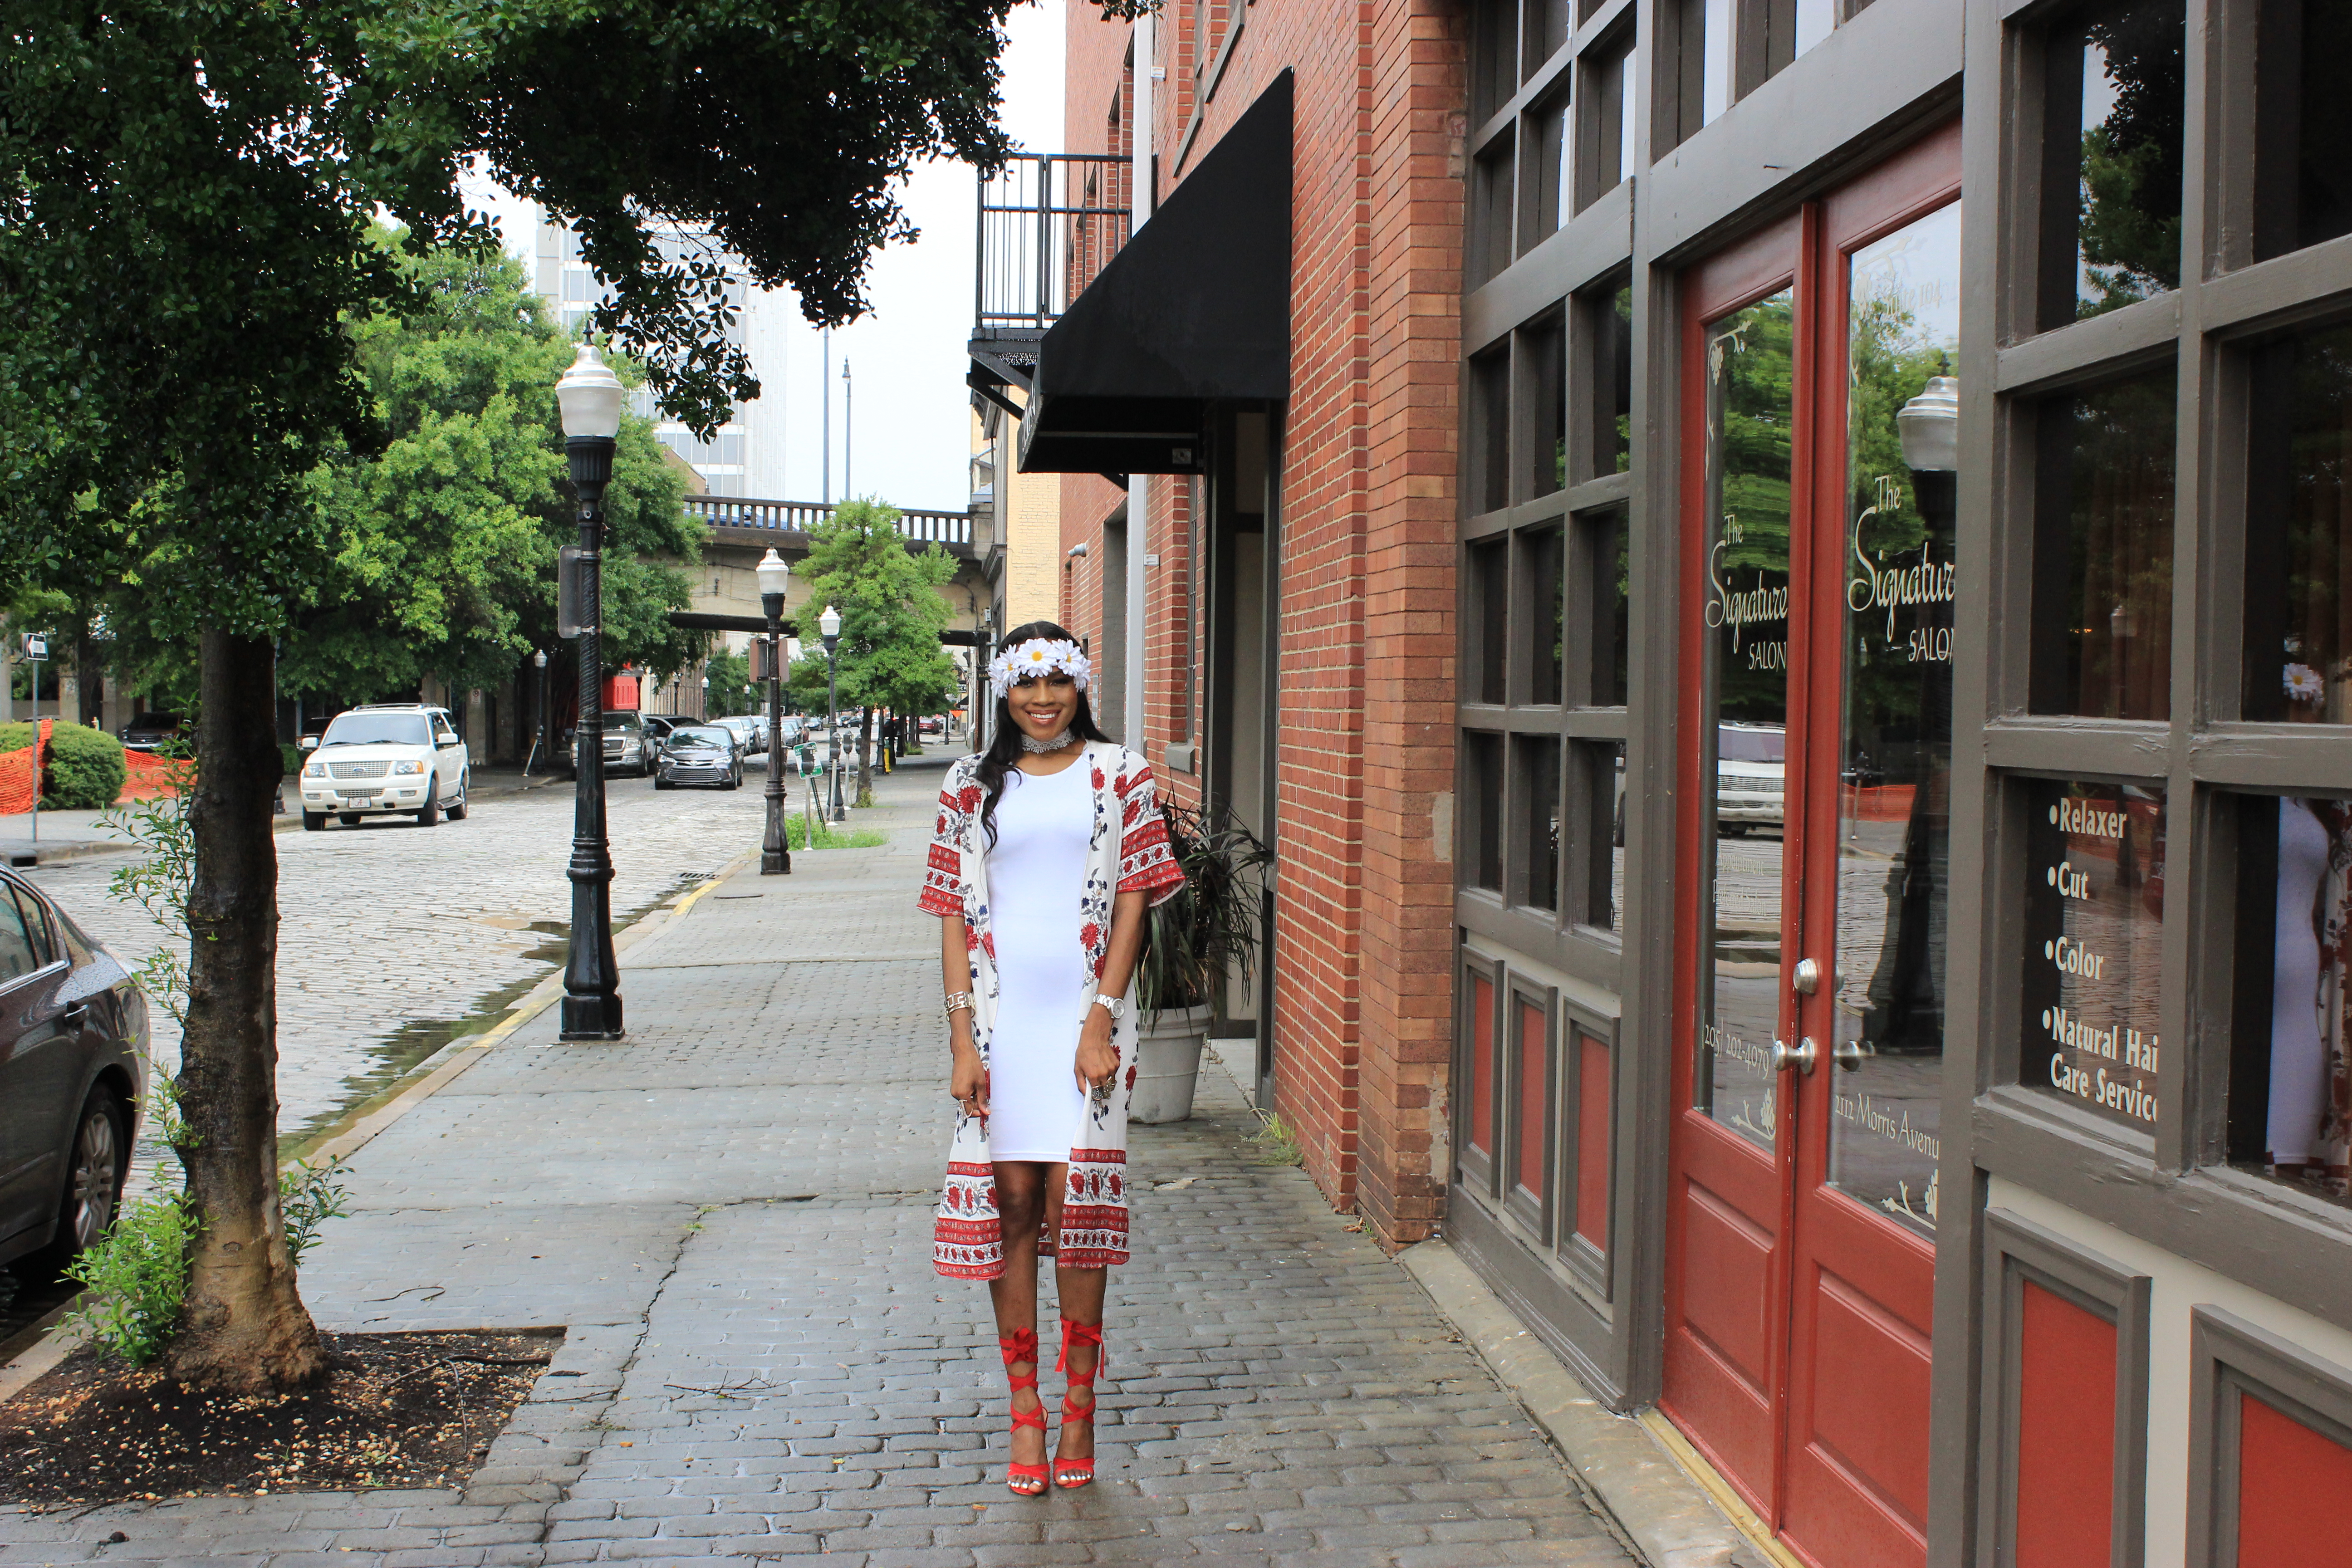 Style-Files-White-forever21-sleeveless-dress-boohoo-Lucy Border Print Maxi Shortsleeve Kimono-Boohoo-ruby-Scalloped Lace Choker-Public-desire-red-lace-uP-heels-forever-21-daisy-headband-oohlalablog-13